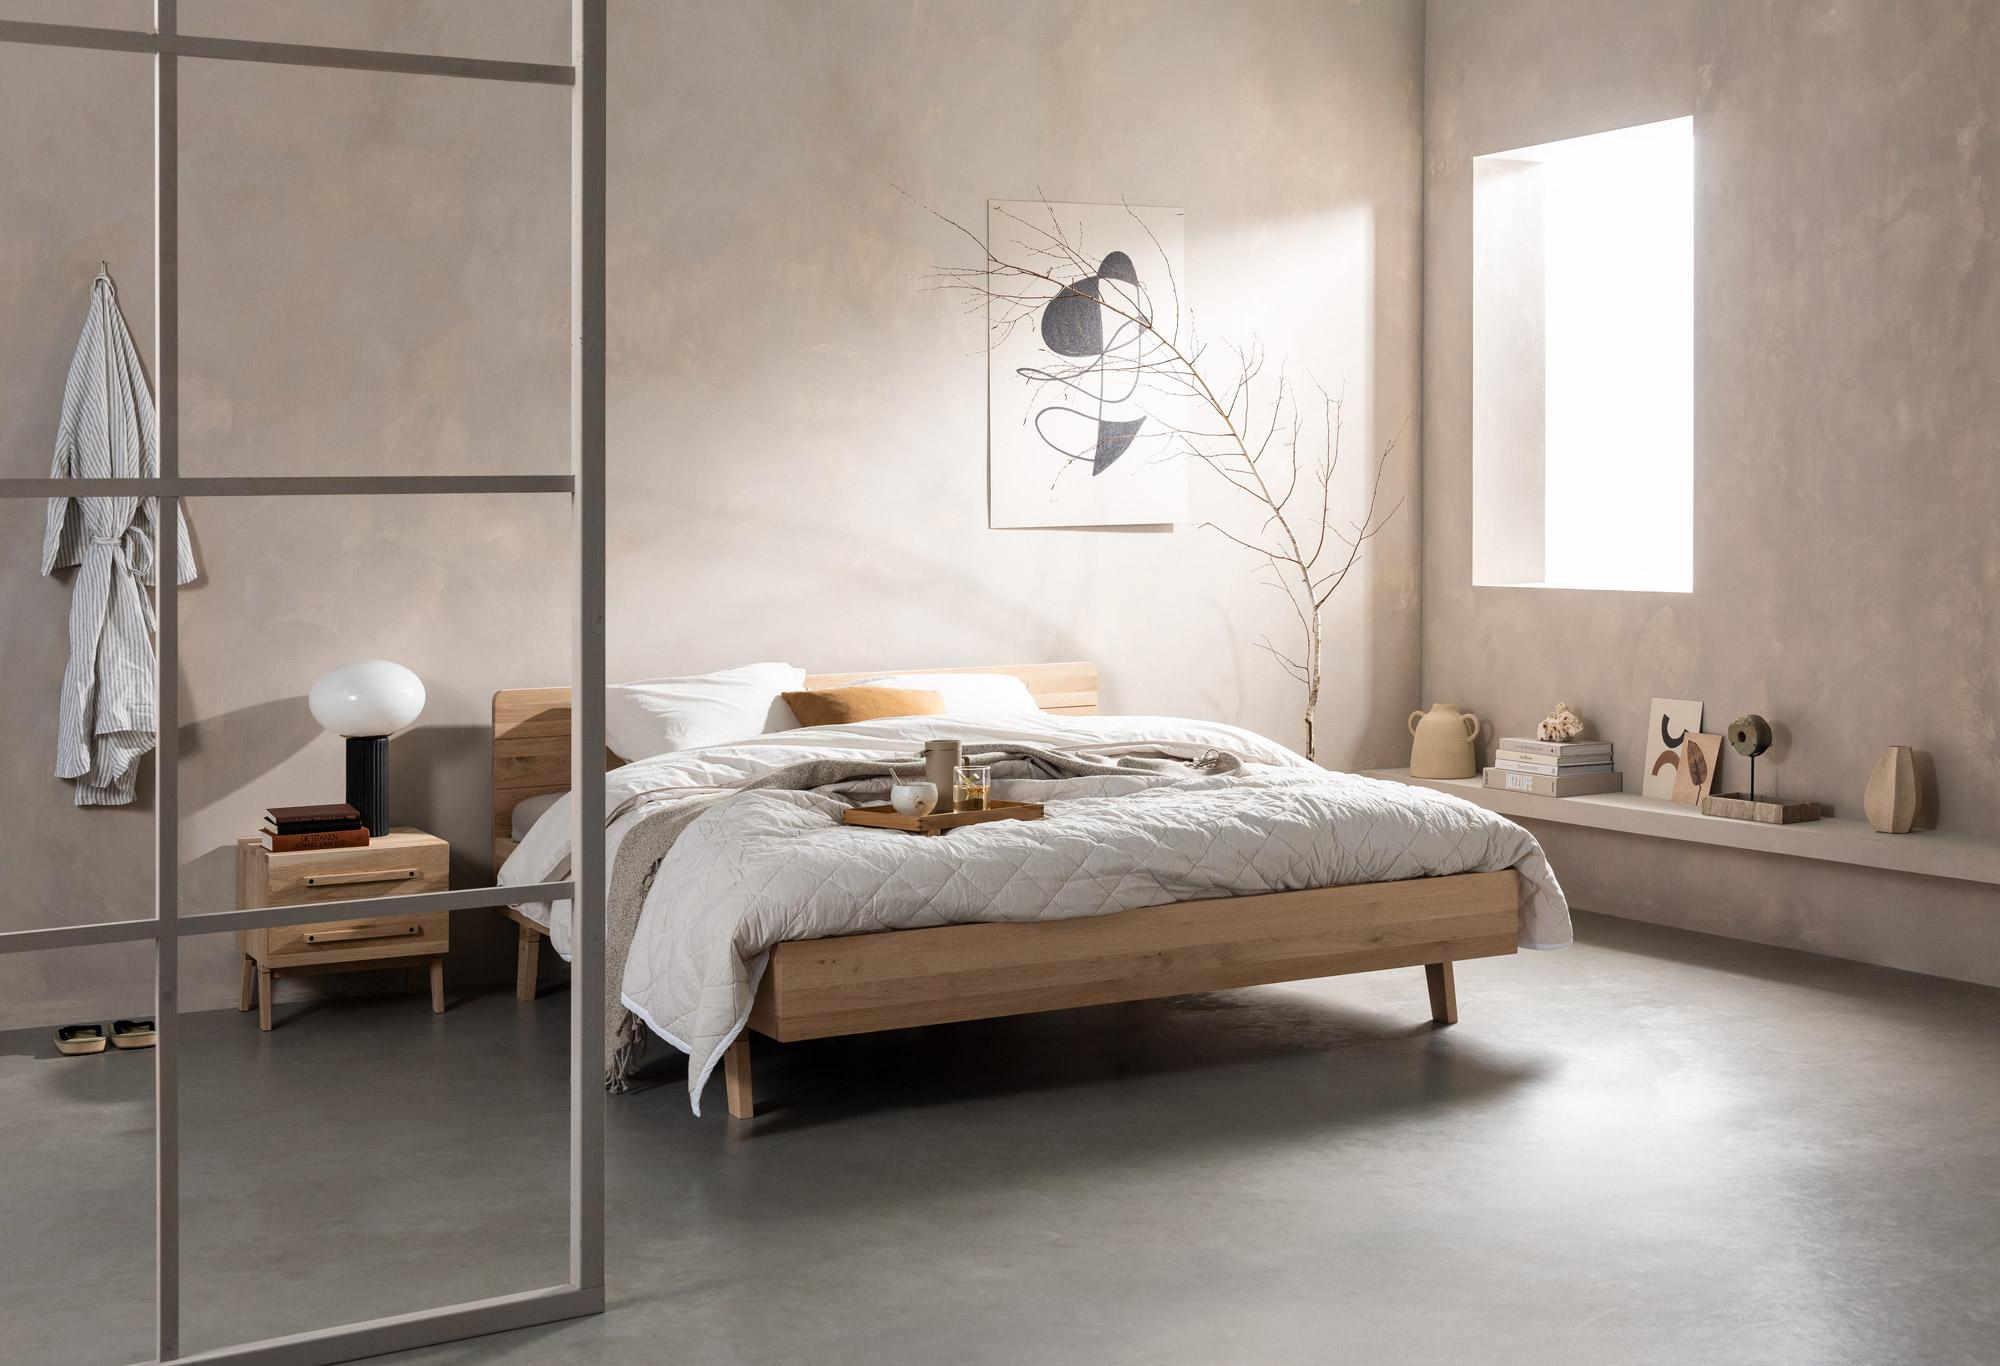 Bedframe balance focus | Swiss Sense